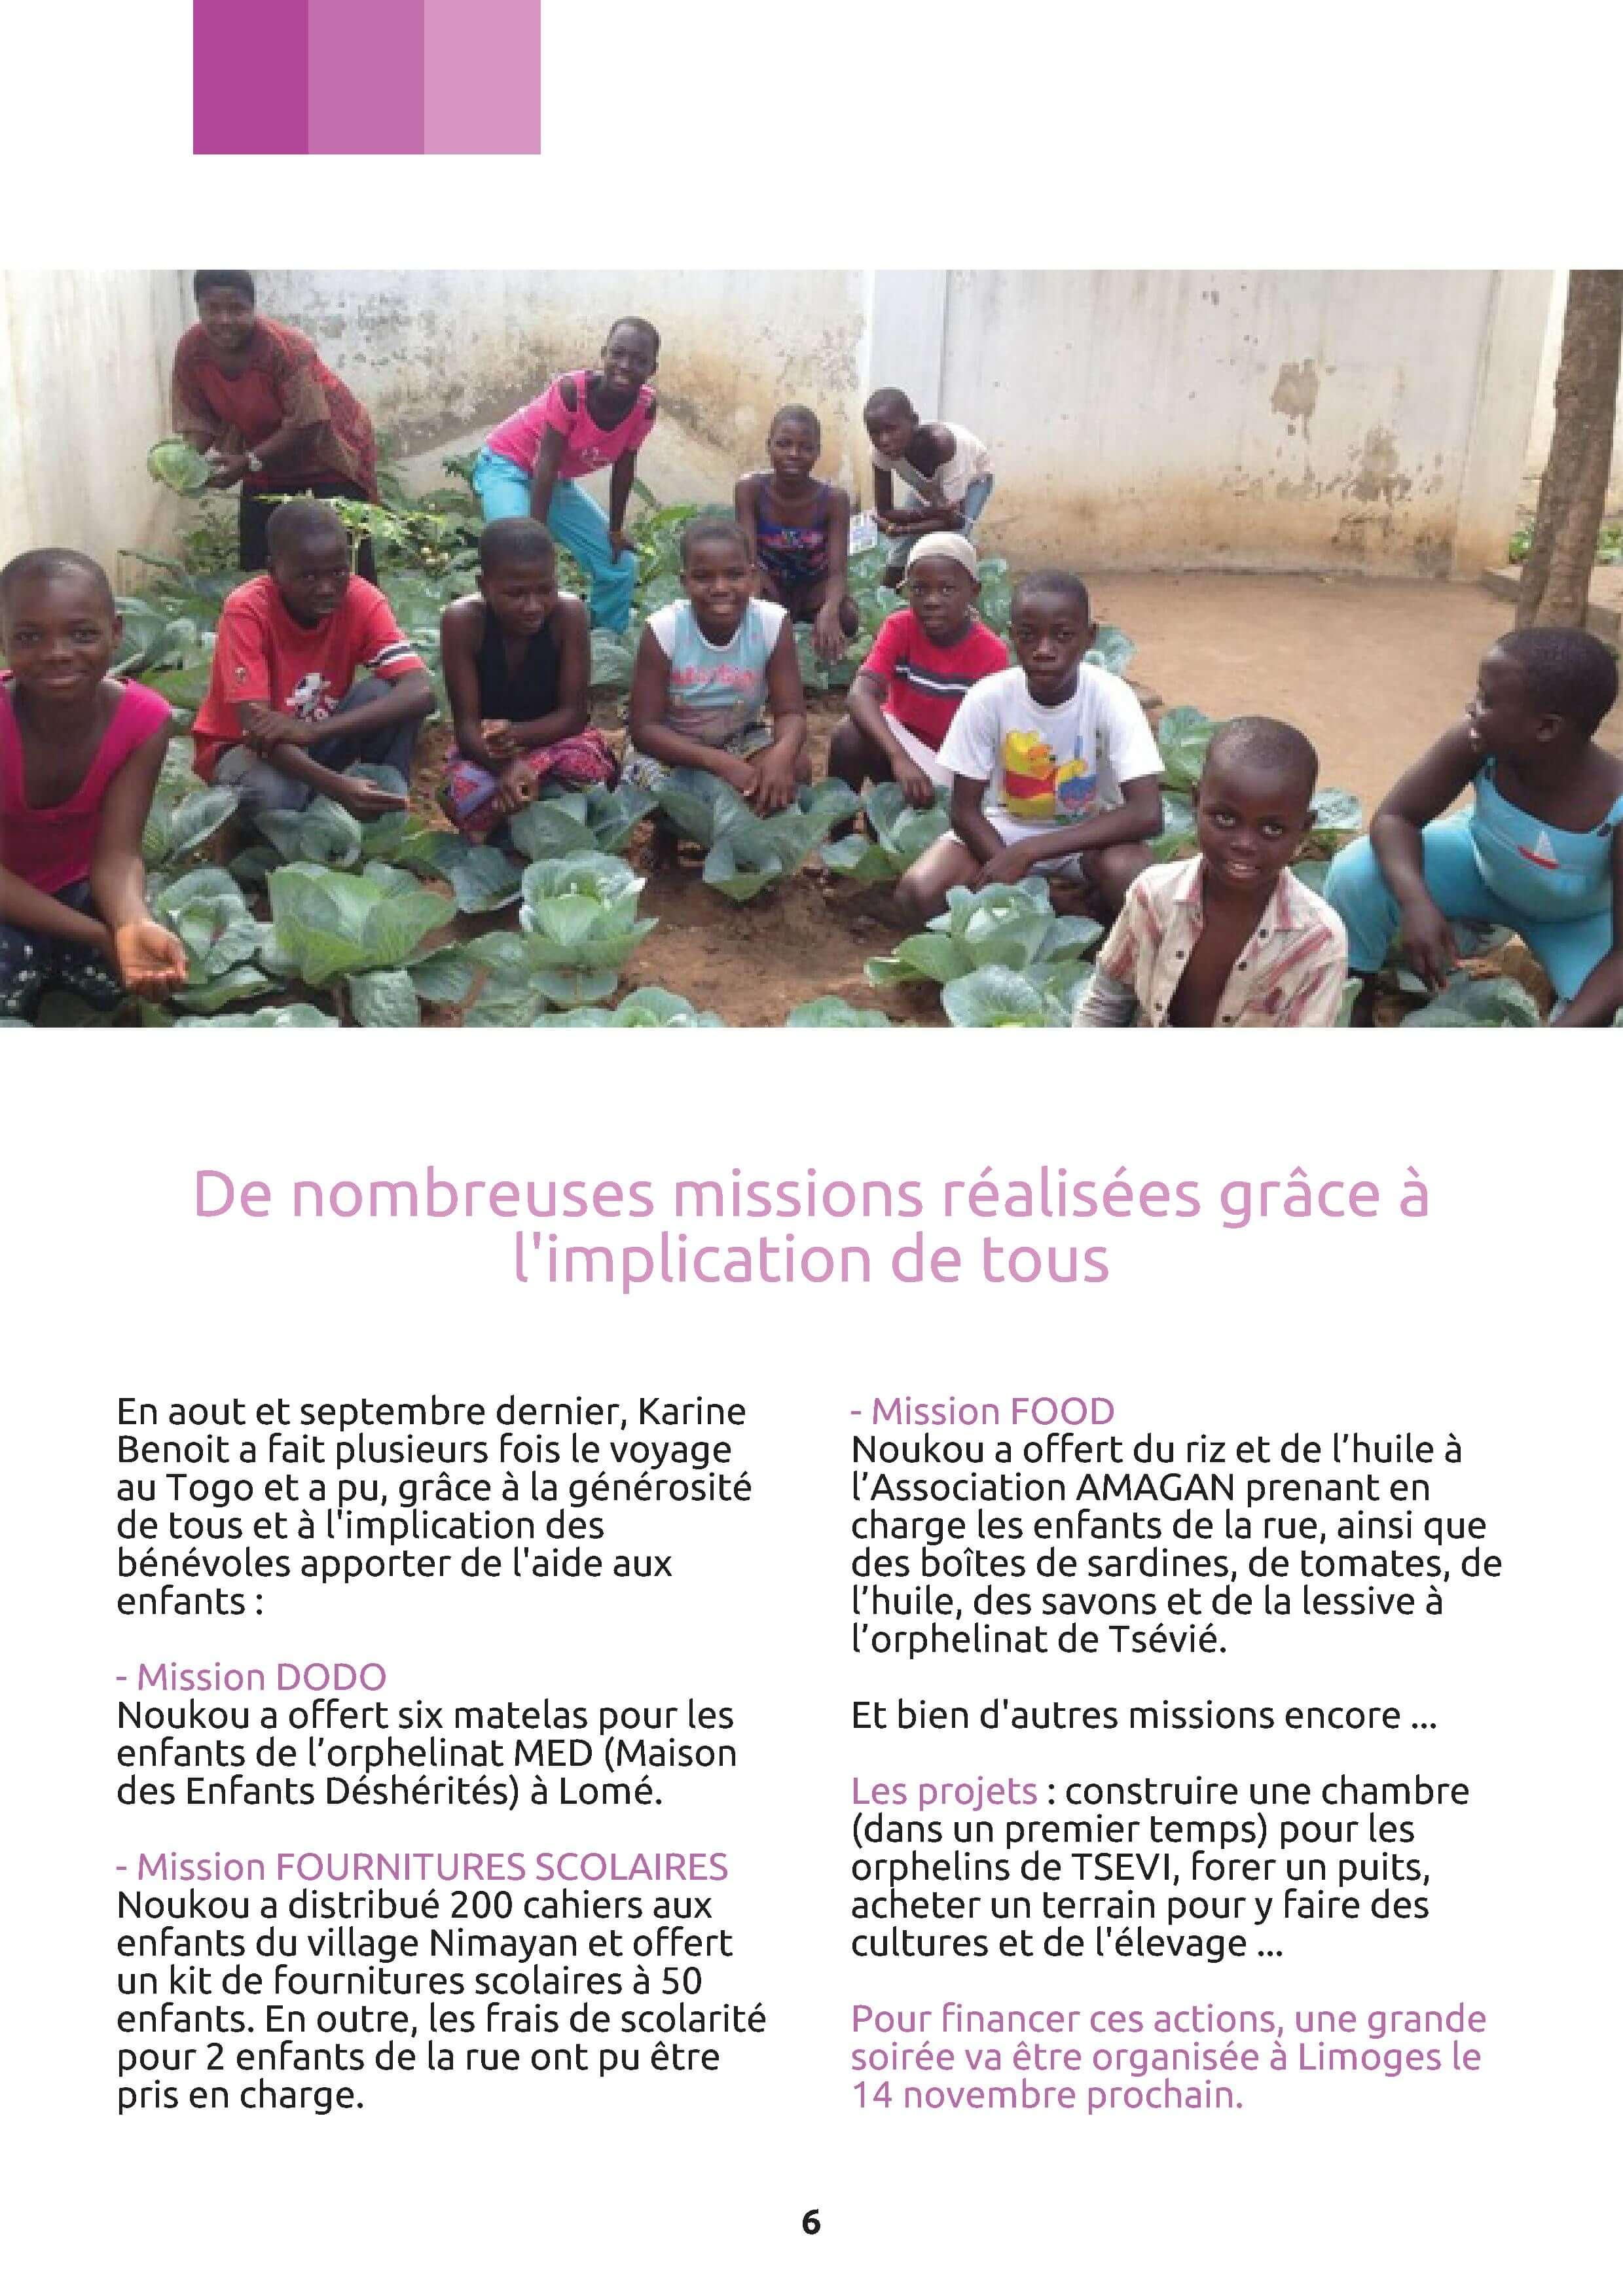 article-karine-benoit-p.3-magsesame-n°-7-Novembre-2013